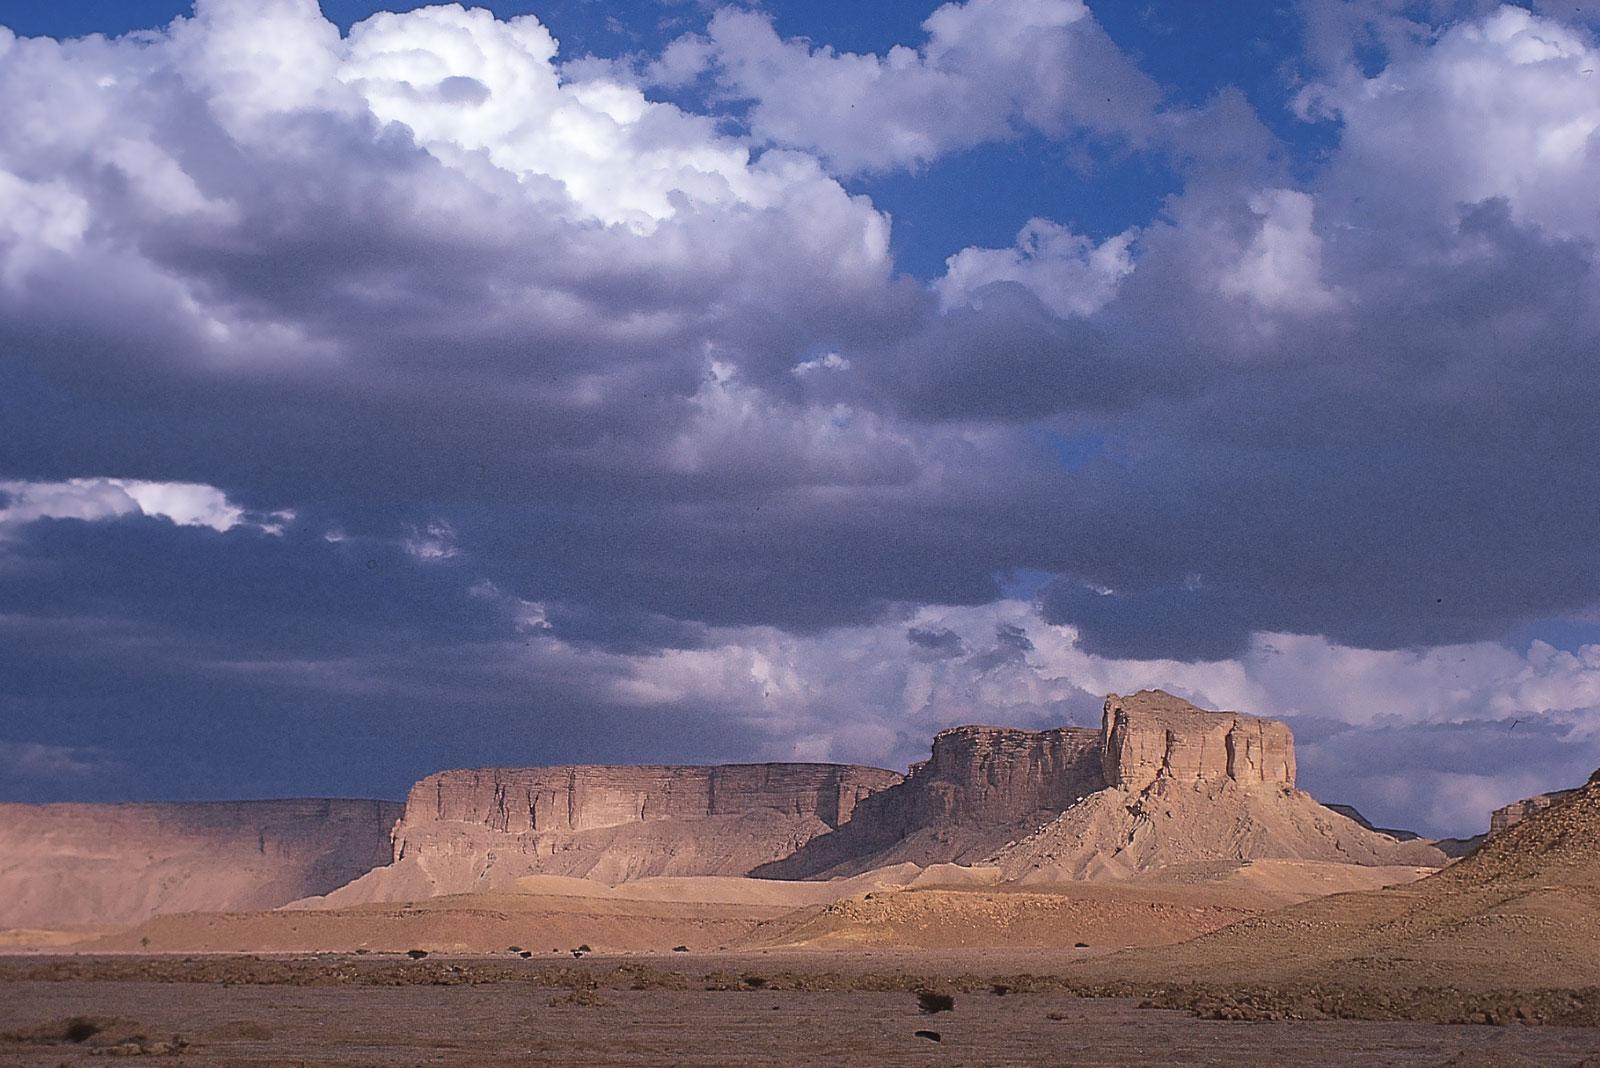 Ṭuwayq Mountains